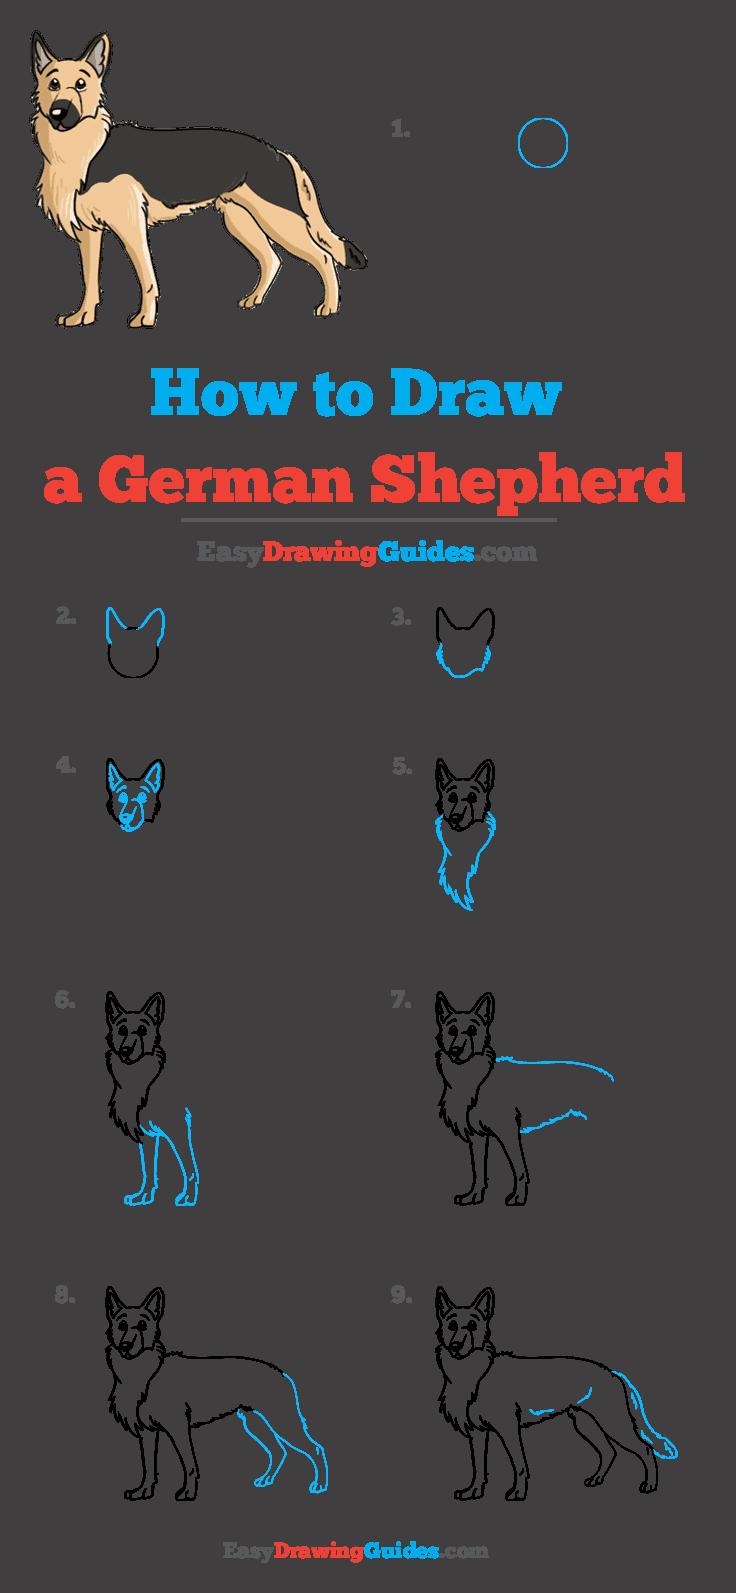 How to Draw German Shepherd